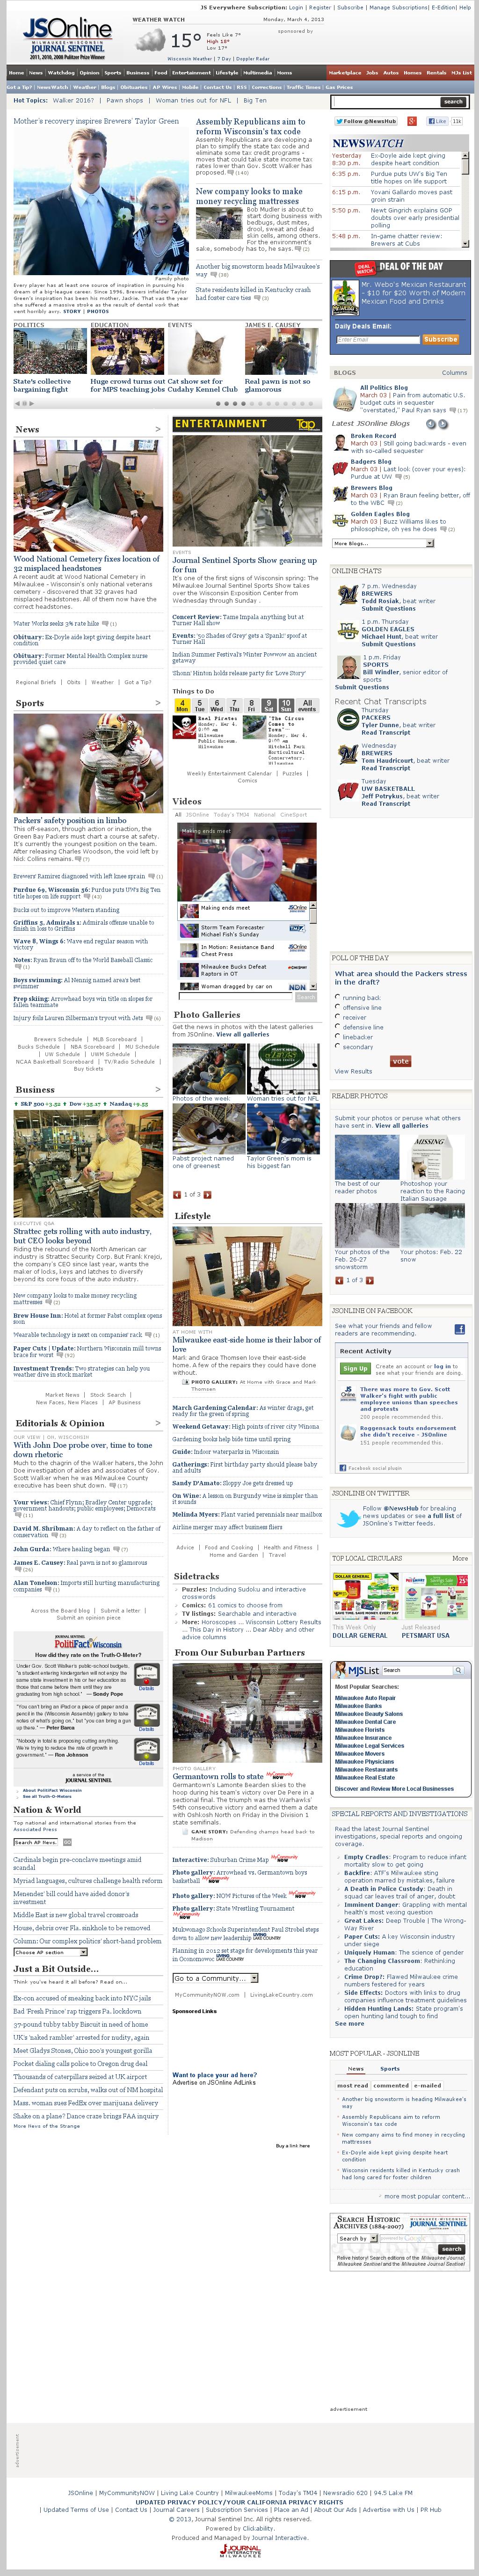 Milwaukee Journal Sentinel at Monday March 4, 2013, 10:11 a.m. UTC